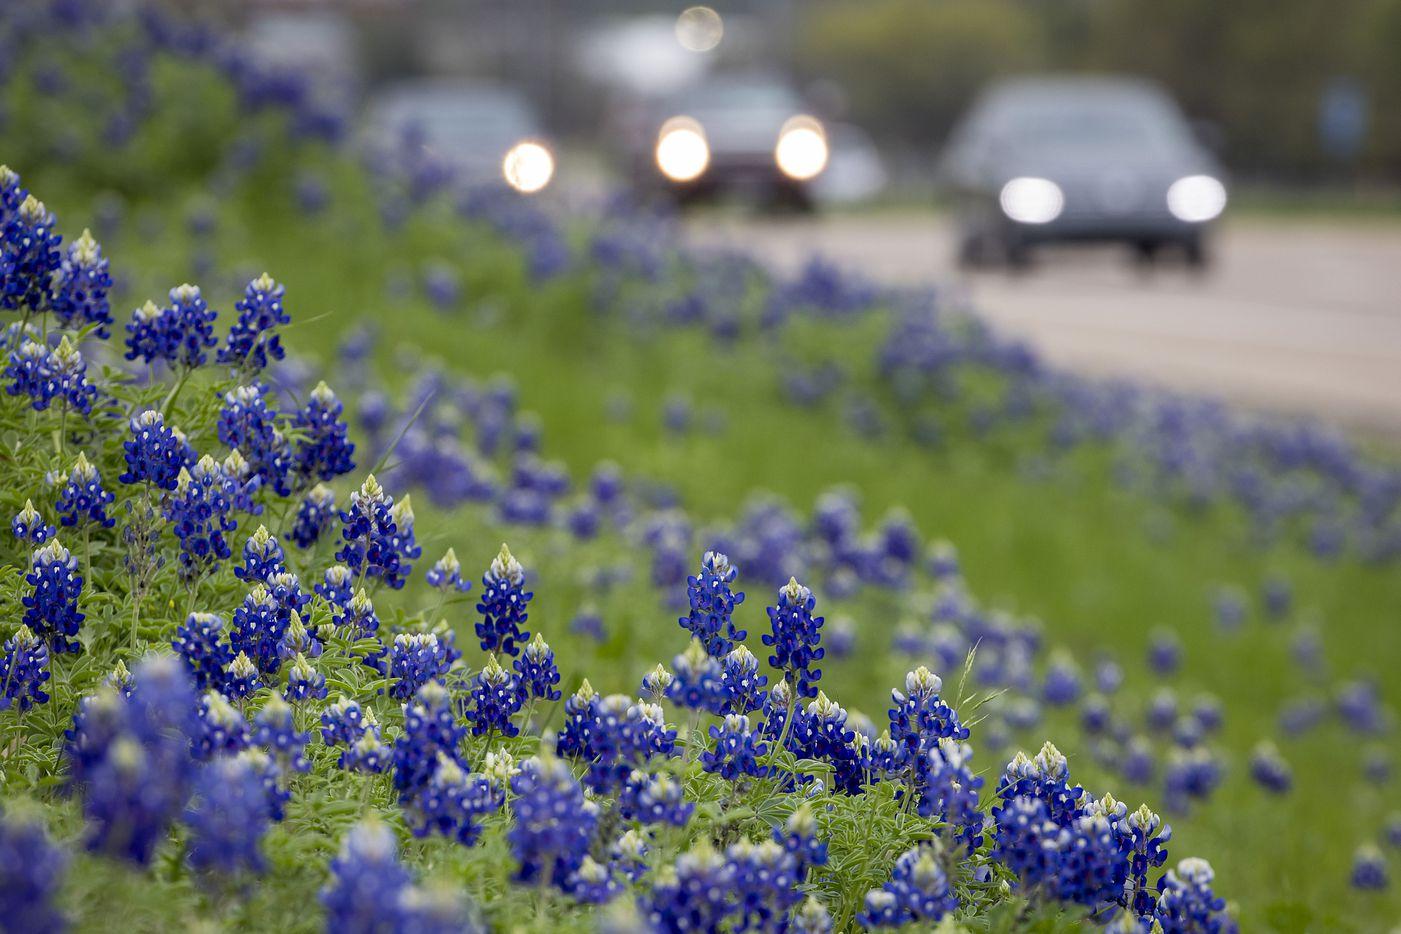 Bluebonnets seen on a hillside next to Interstate 45 in Ennis.